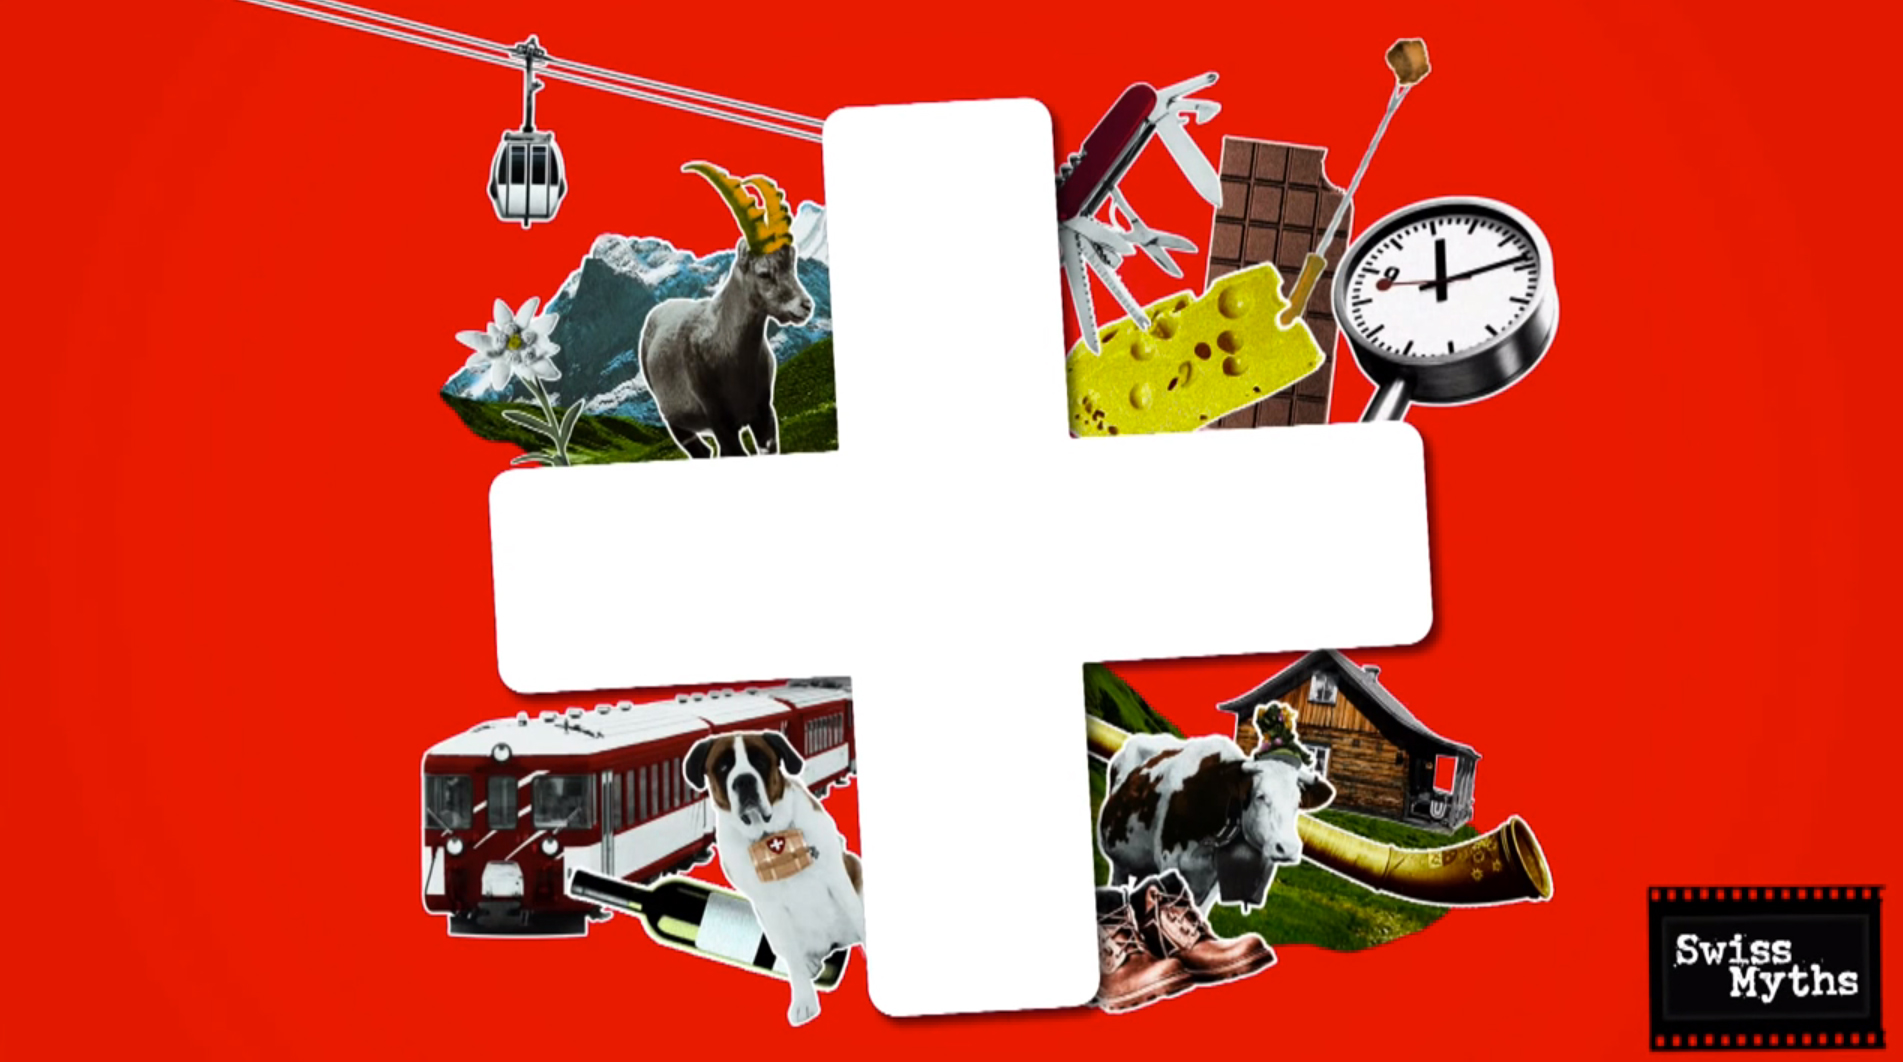 Swiss Myths